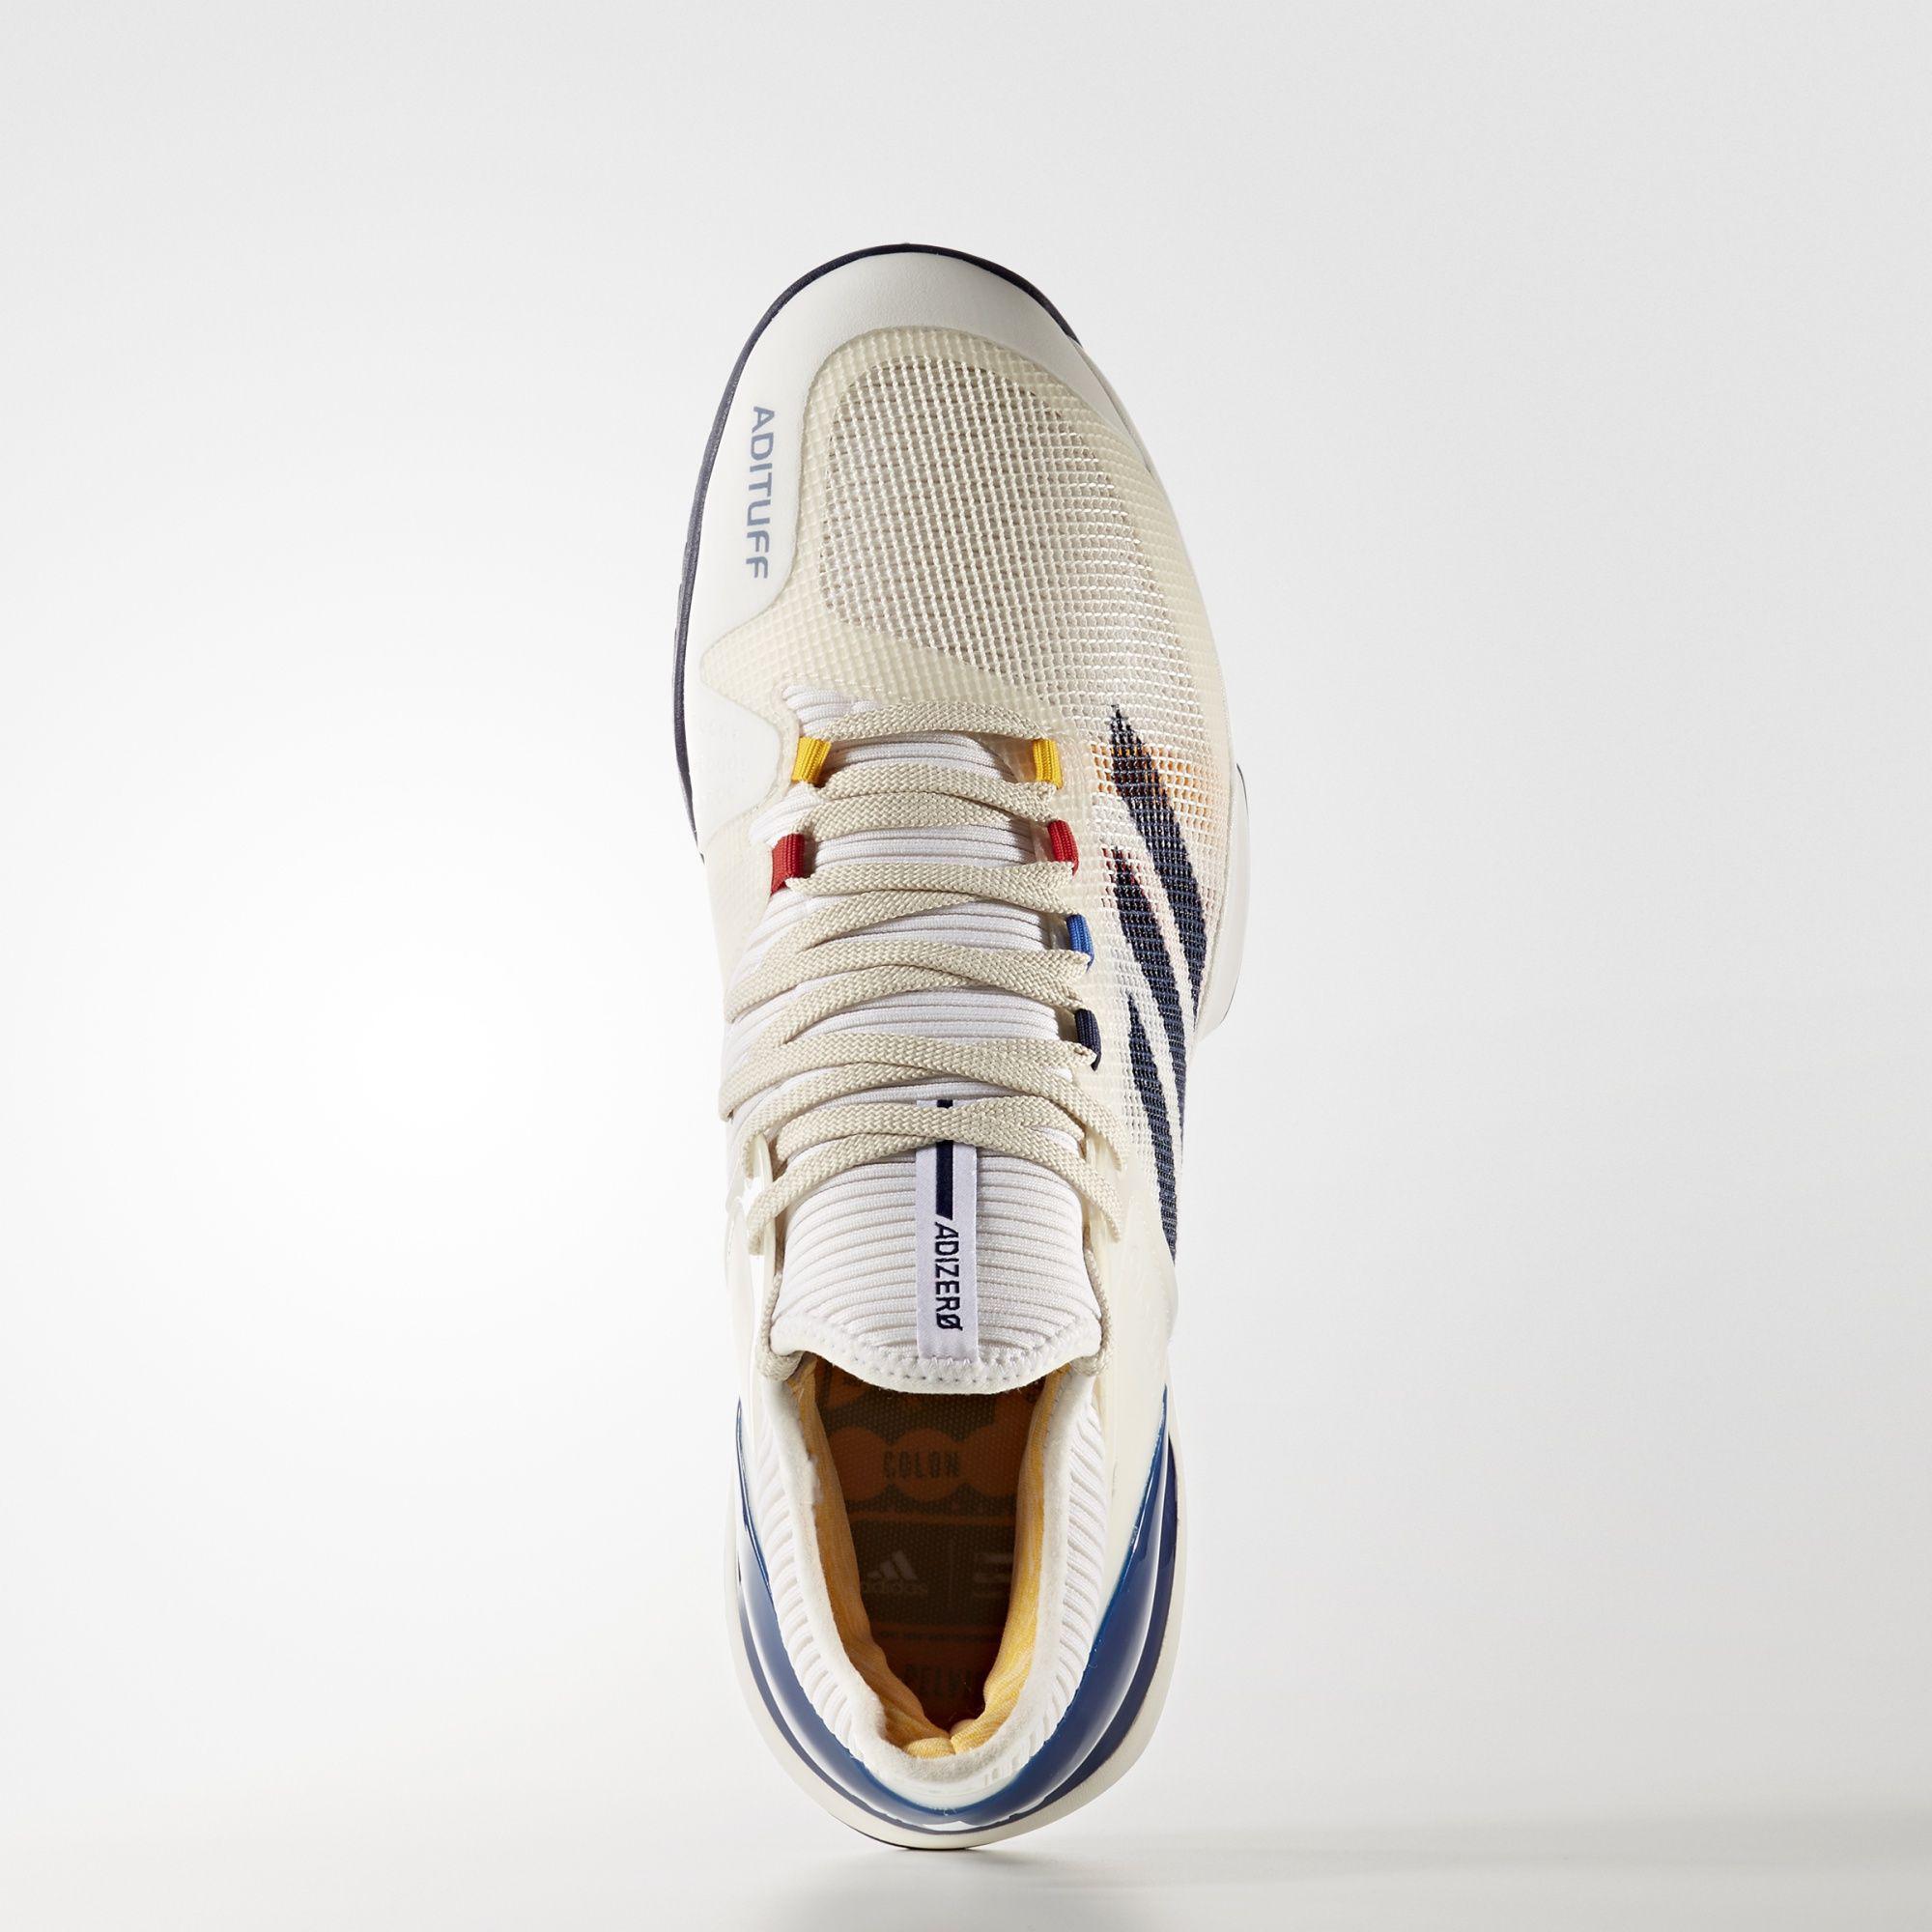 sneakers for cheap 51dc5 9725a Adidas Mens Adizero Ubersonic 2.0 Pharrell Williams Tennis Shoes -  Multi-Colour